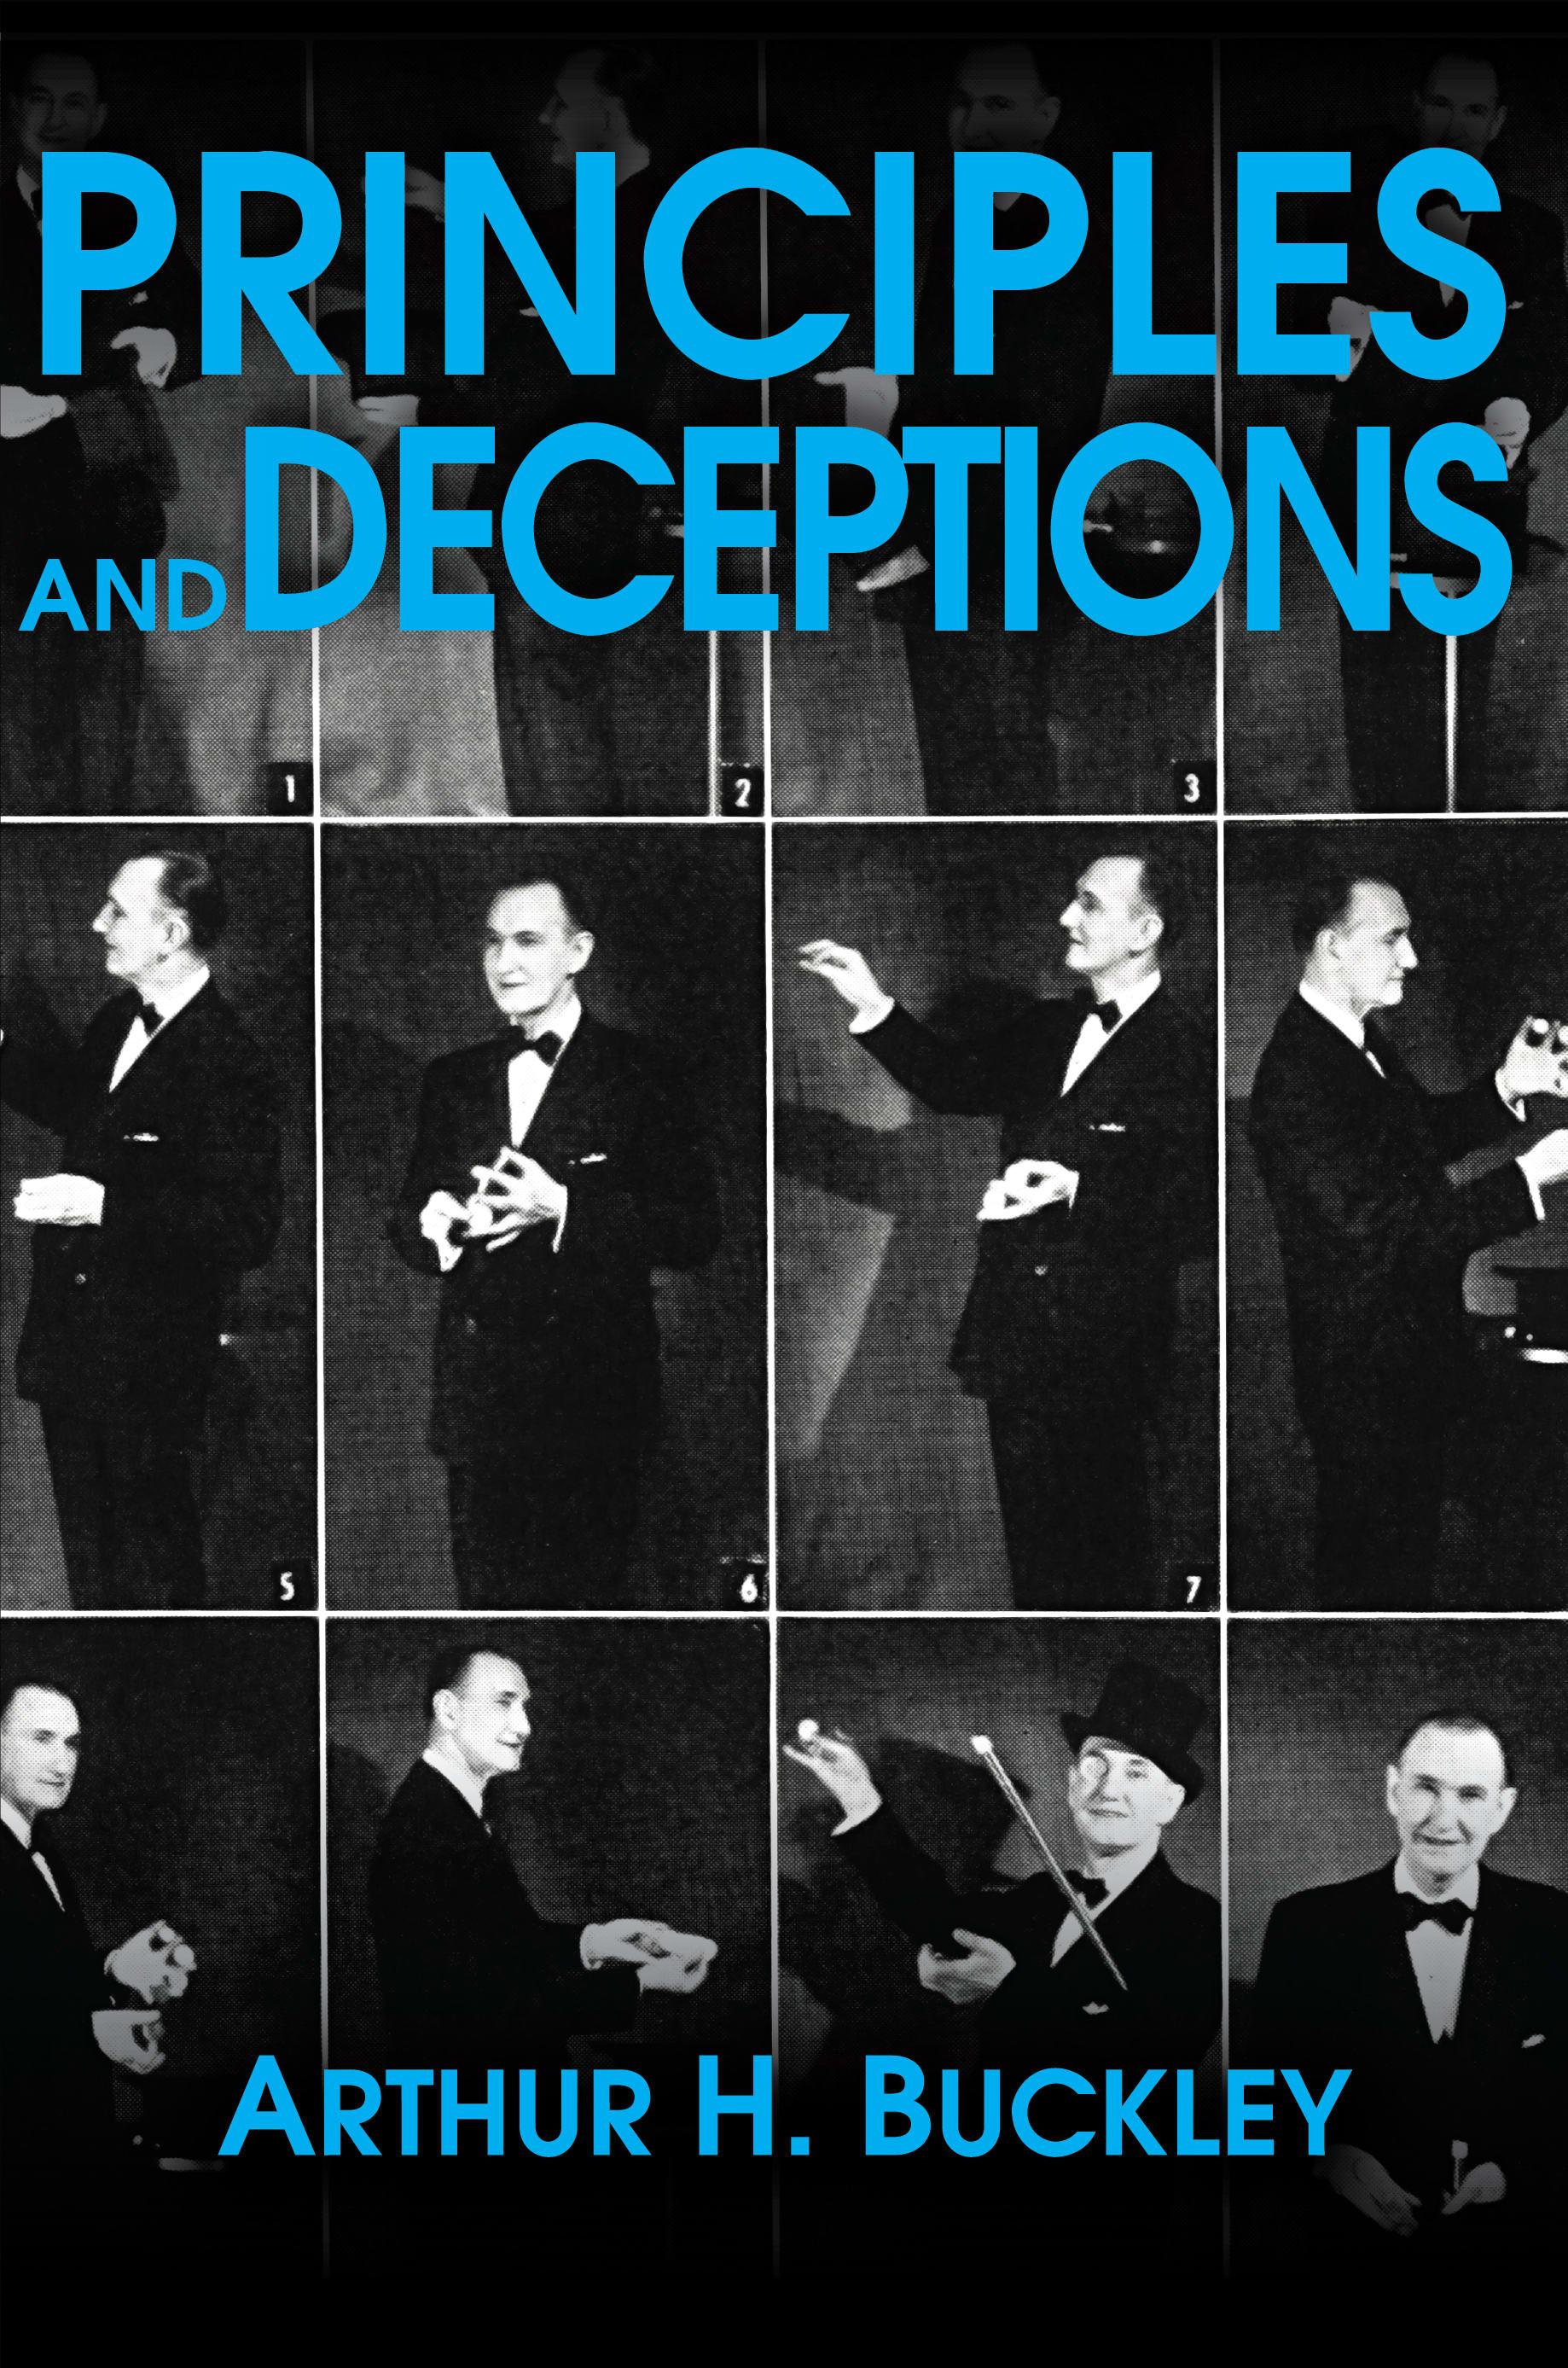 Principles and Deceptions